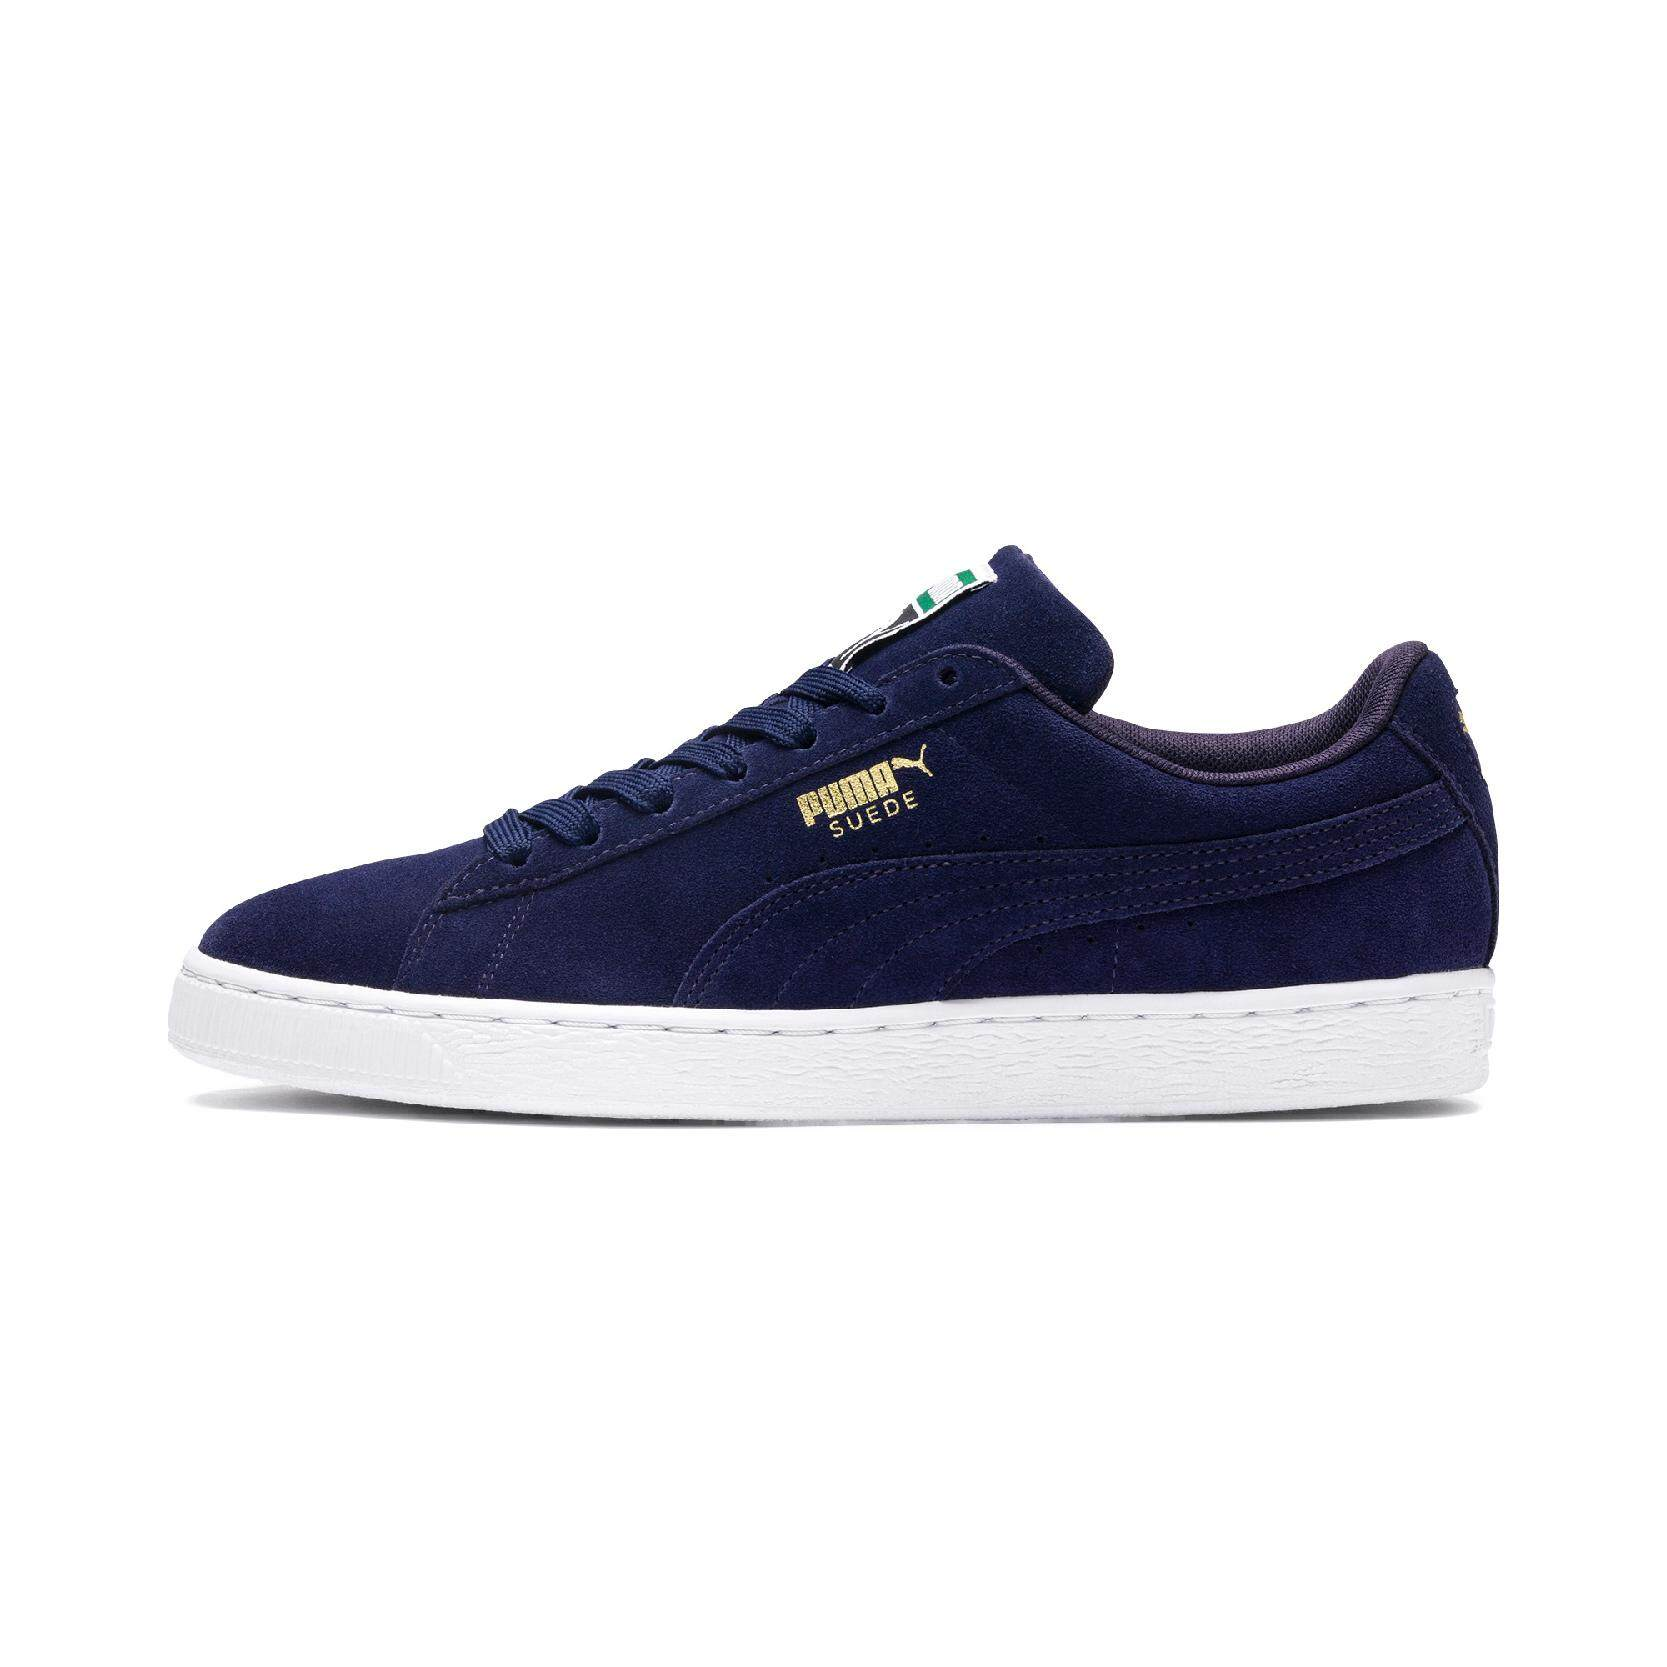 Puma Suede Classic Sepatu Sneakers Olahraga Black White - Daftar ... 1d8bcdac75